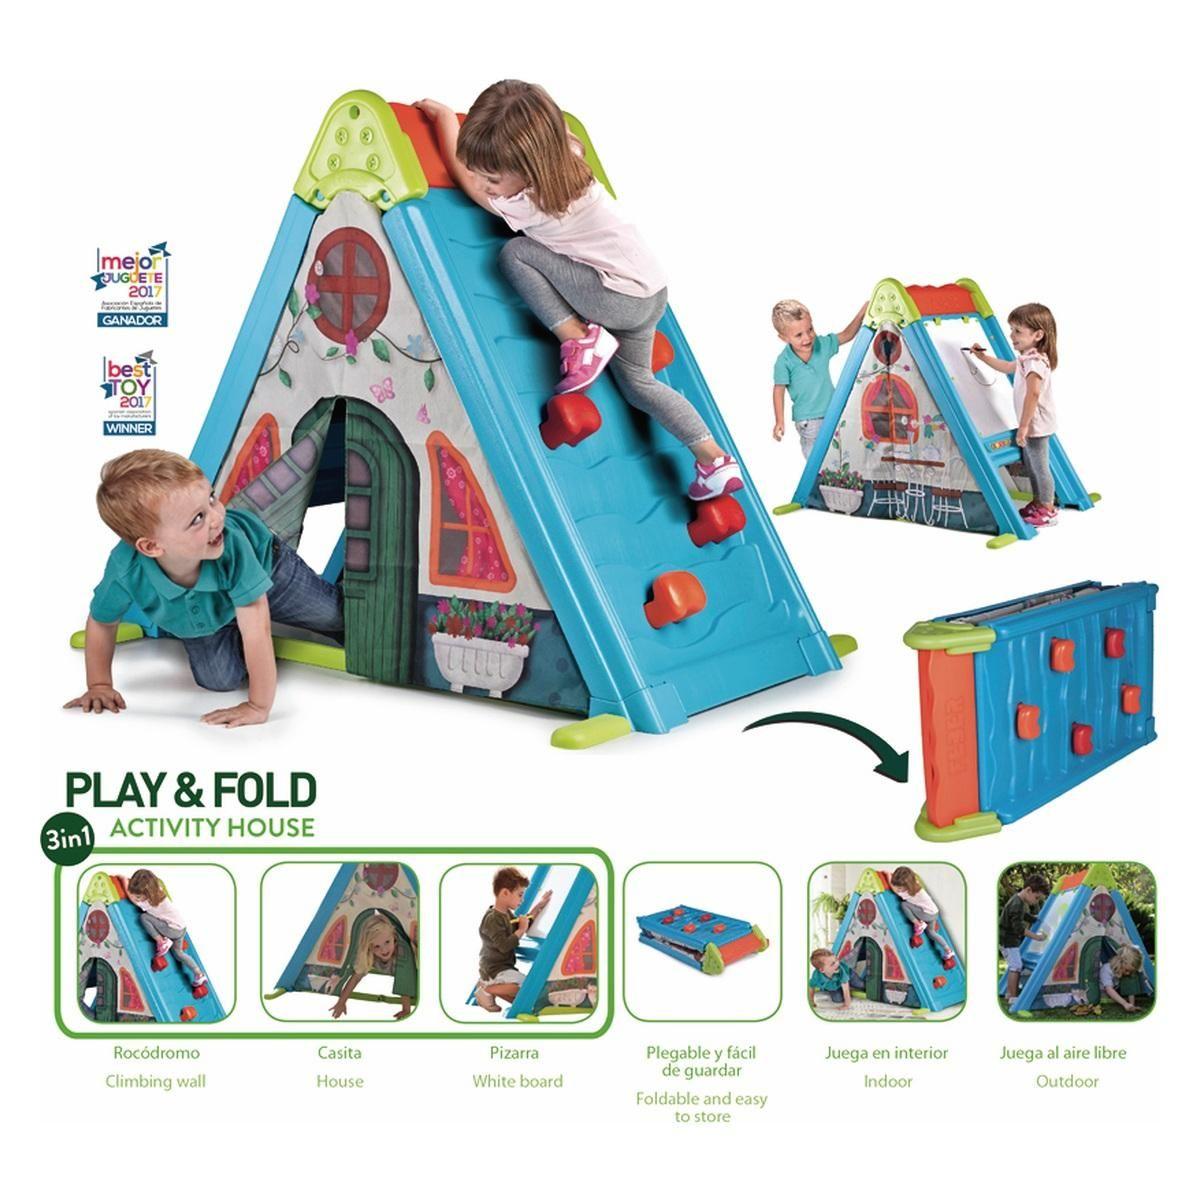 Hiša aktivnosti - Igraj & zloži - 3 v 1 | Baby Center ...